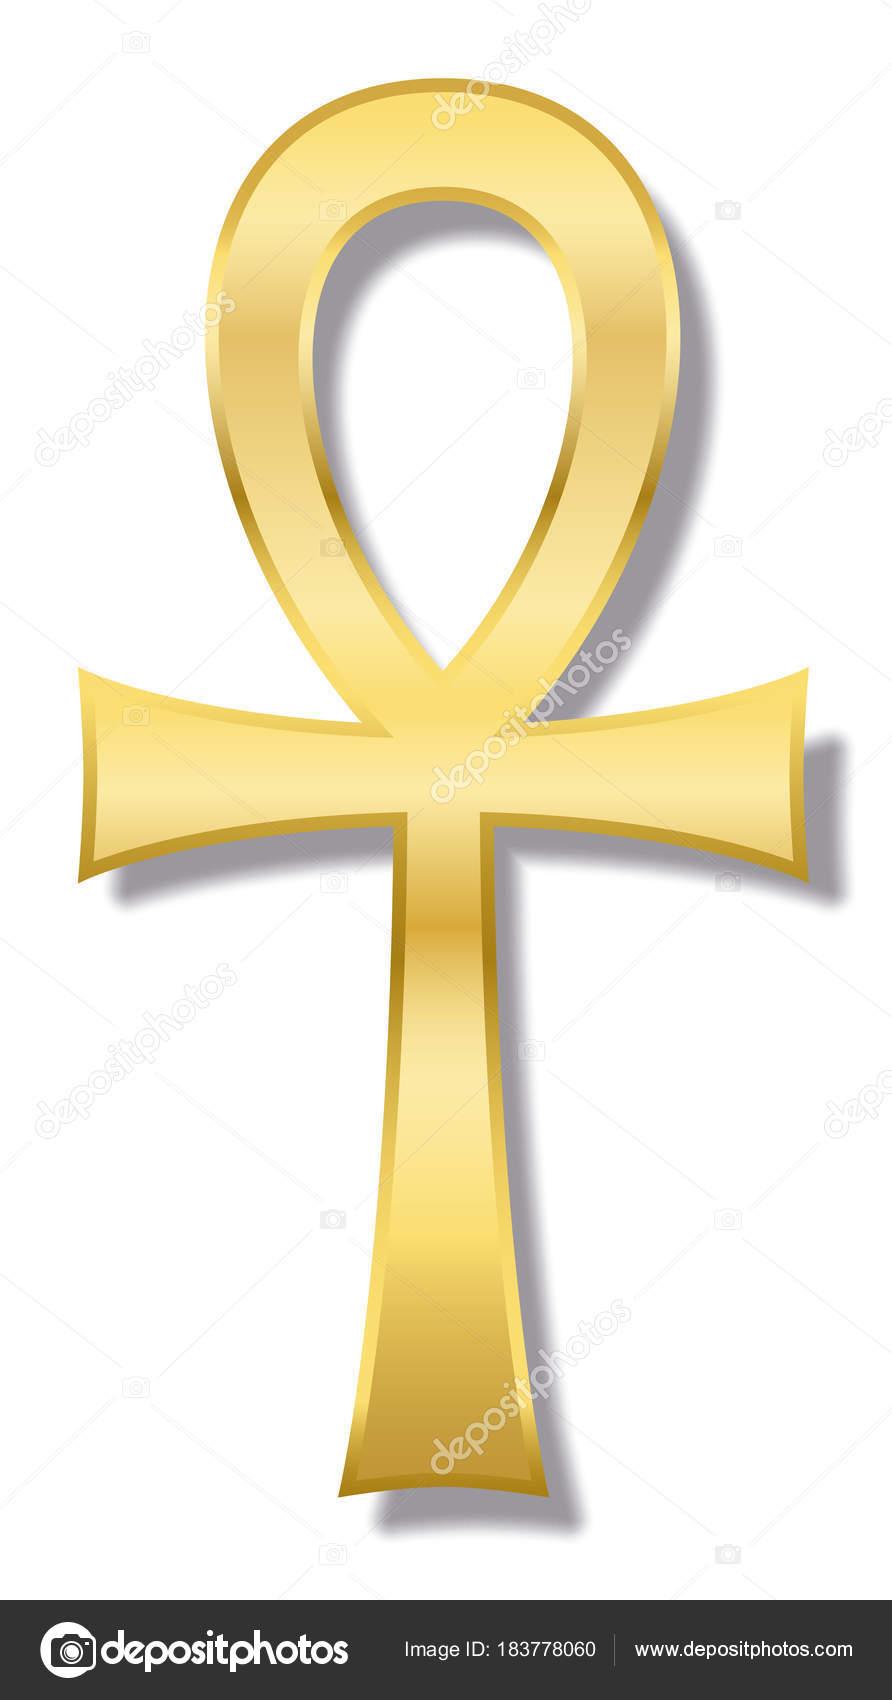 Ankh egyptian hieroglyphic golden symbol stock vector furian ankh egyptian hieroglyphic golden symbol stock vector buycottarizona Image collections